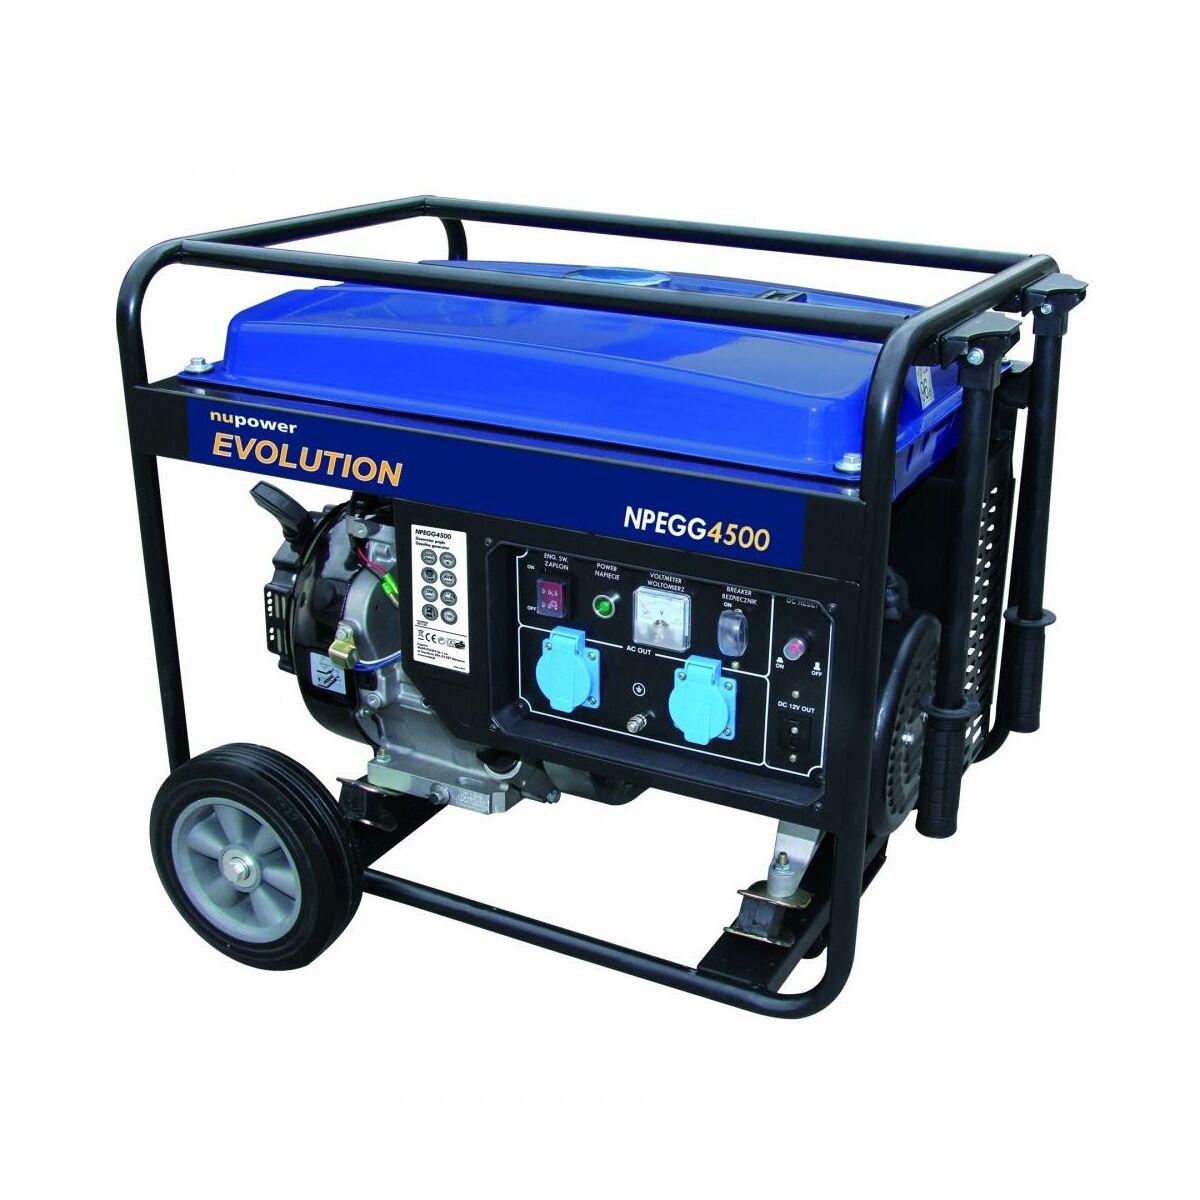 Generator pr dotw rczy npegg4500 nupower agregaty for Generatore hyundai leroy merlin